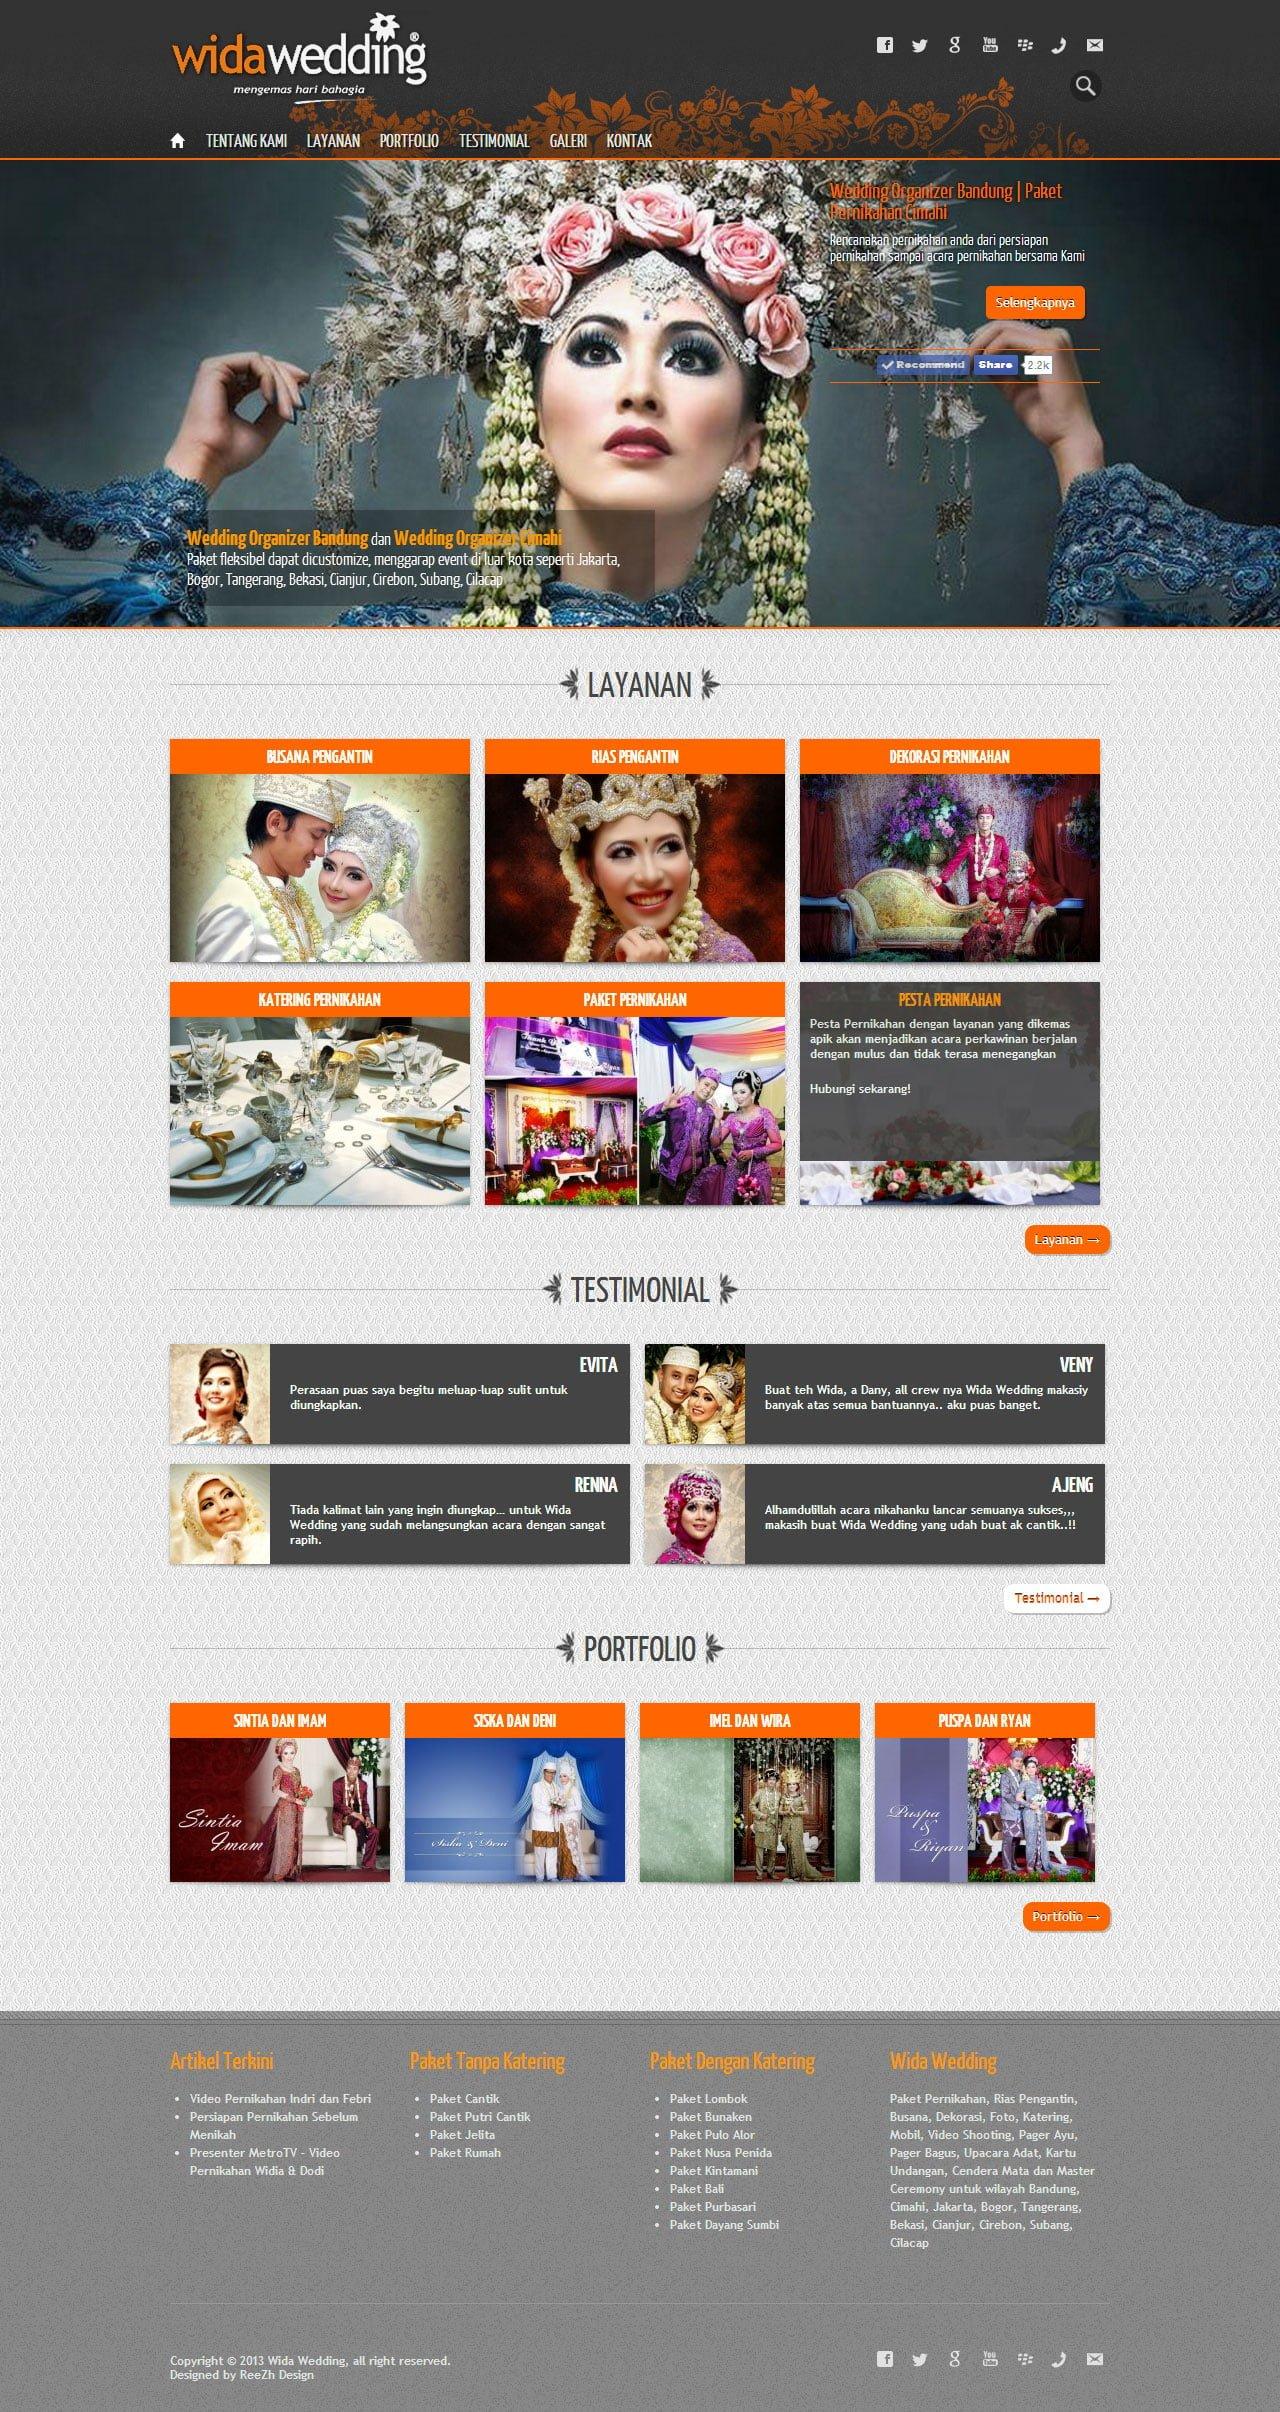 Wida Wedding Organizer Bandung Cimahi